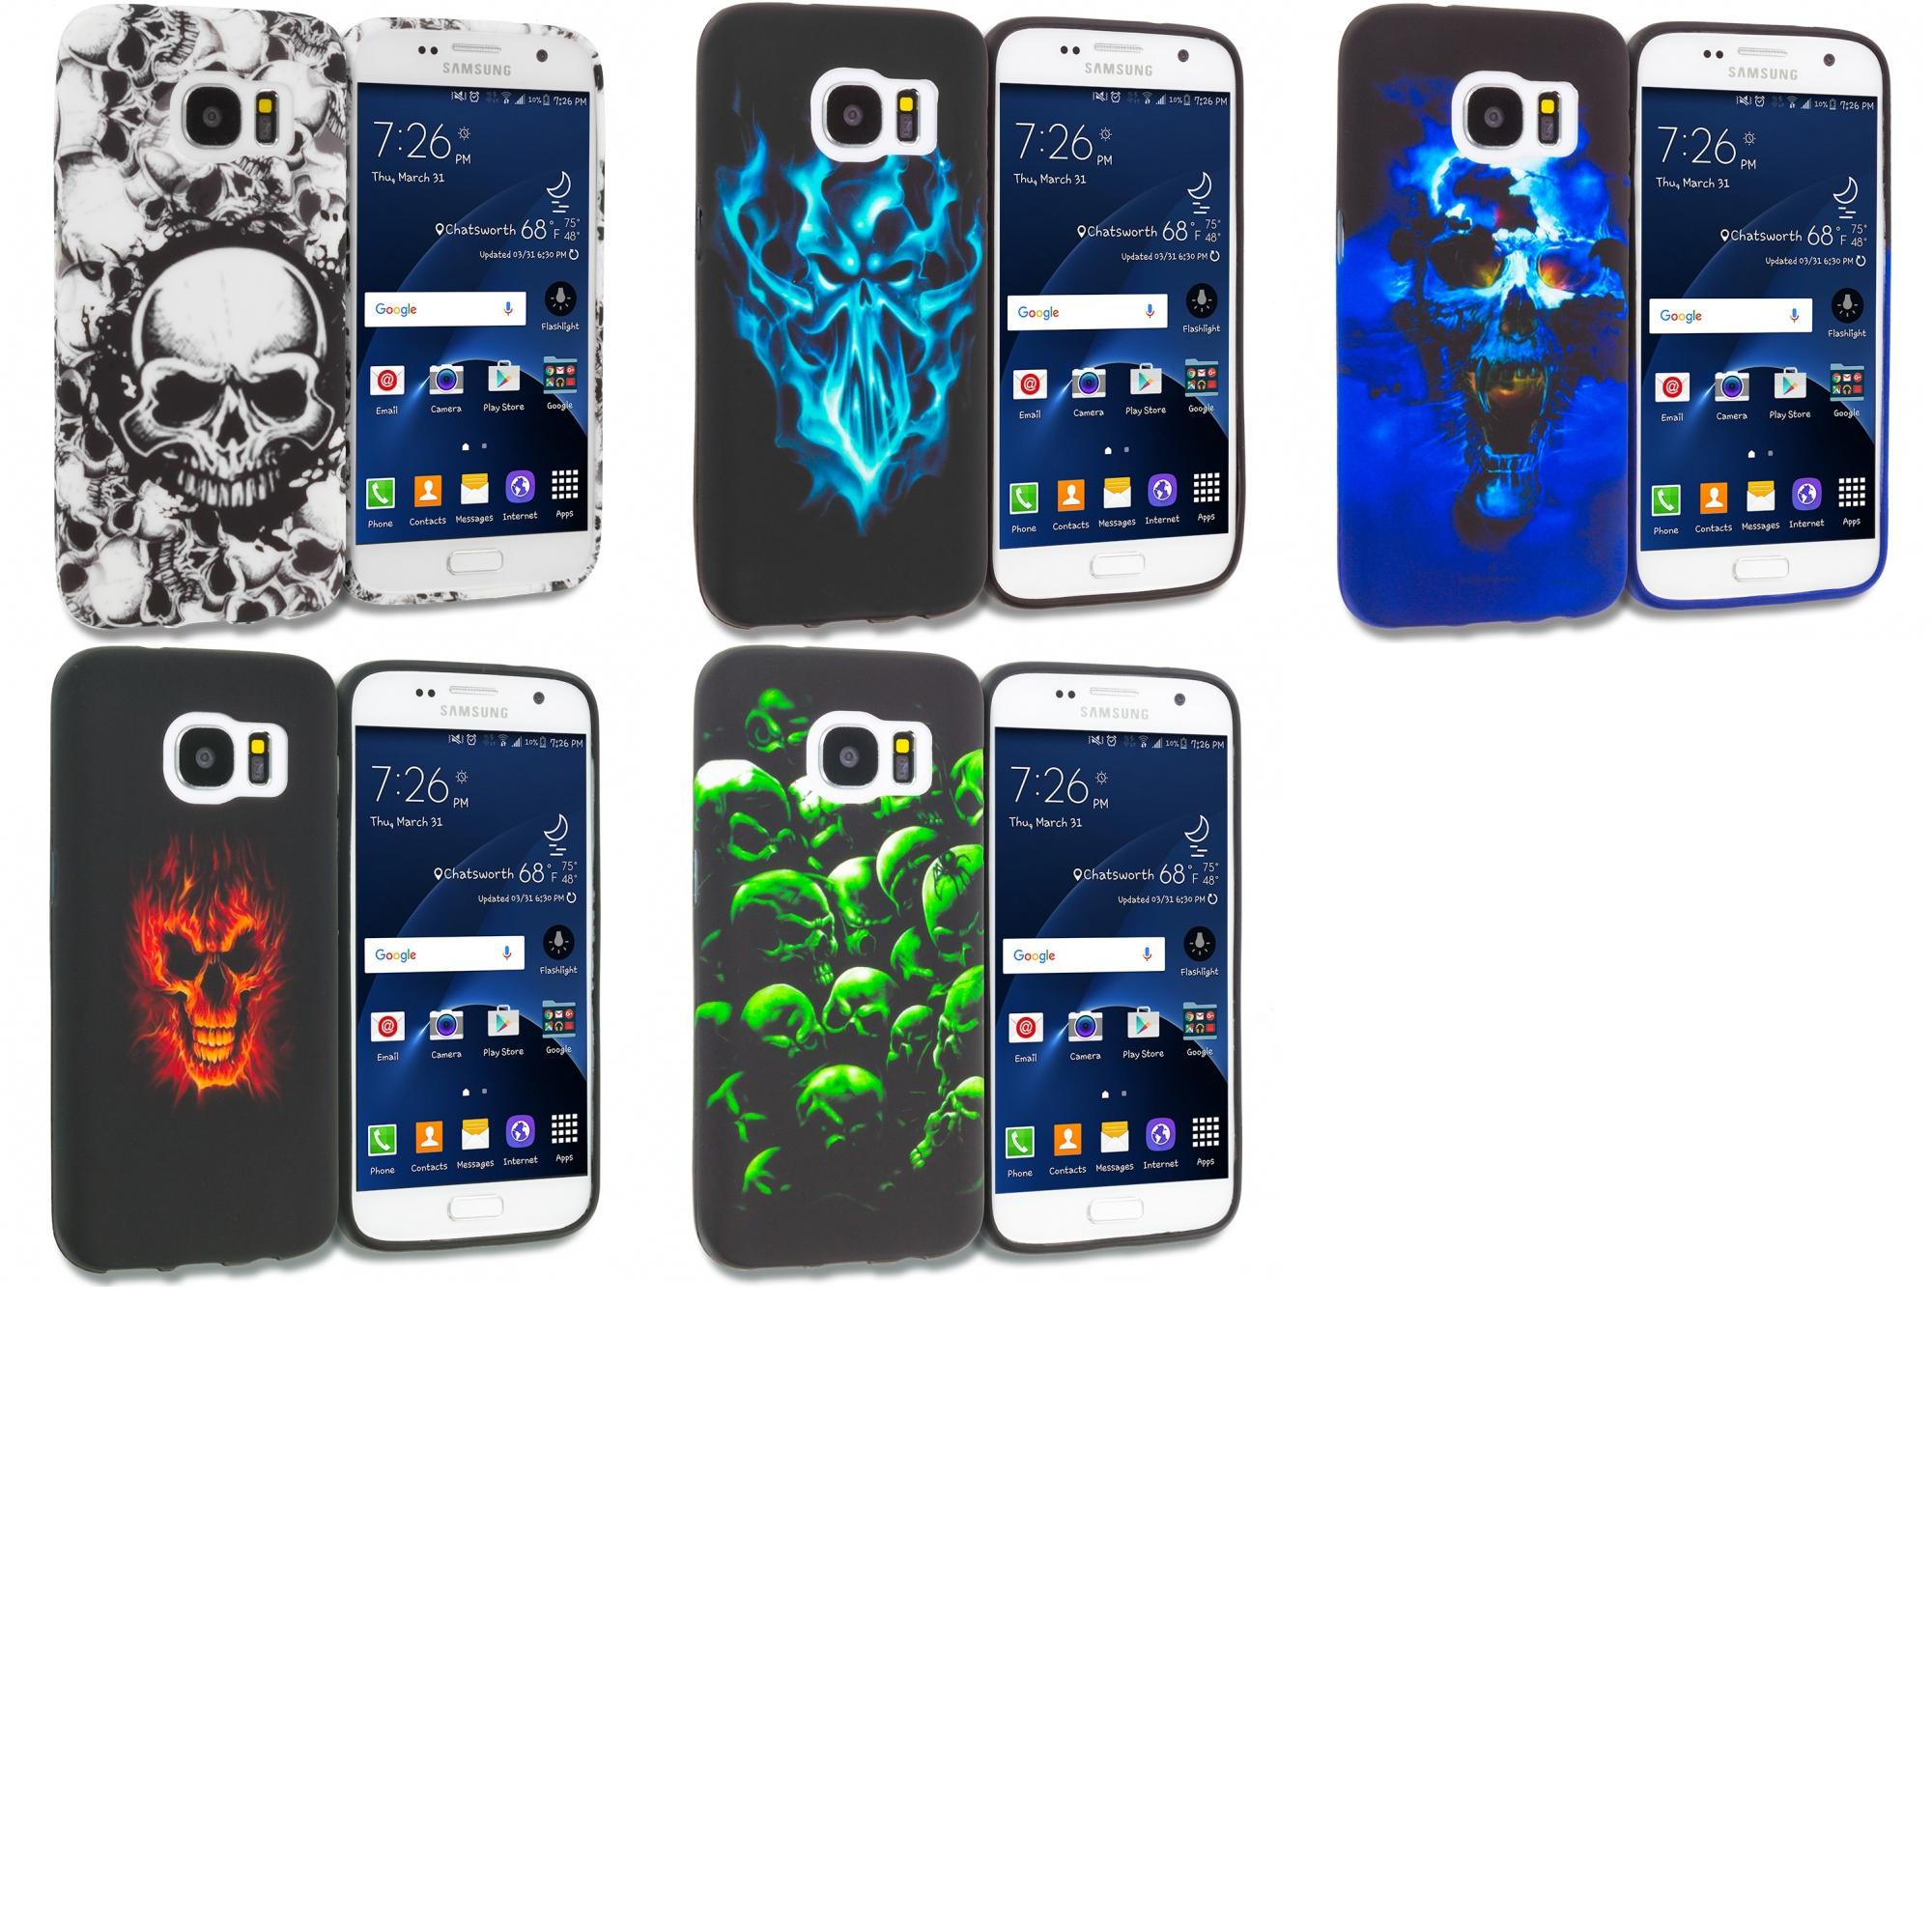 Samsung Galaxy S7 Combo Pack : Black White Skulls TPU Design Soft Rubber Case Cover